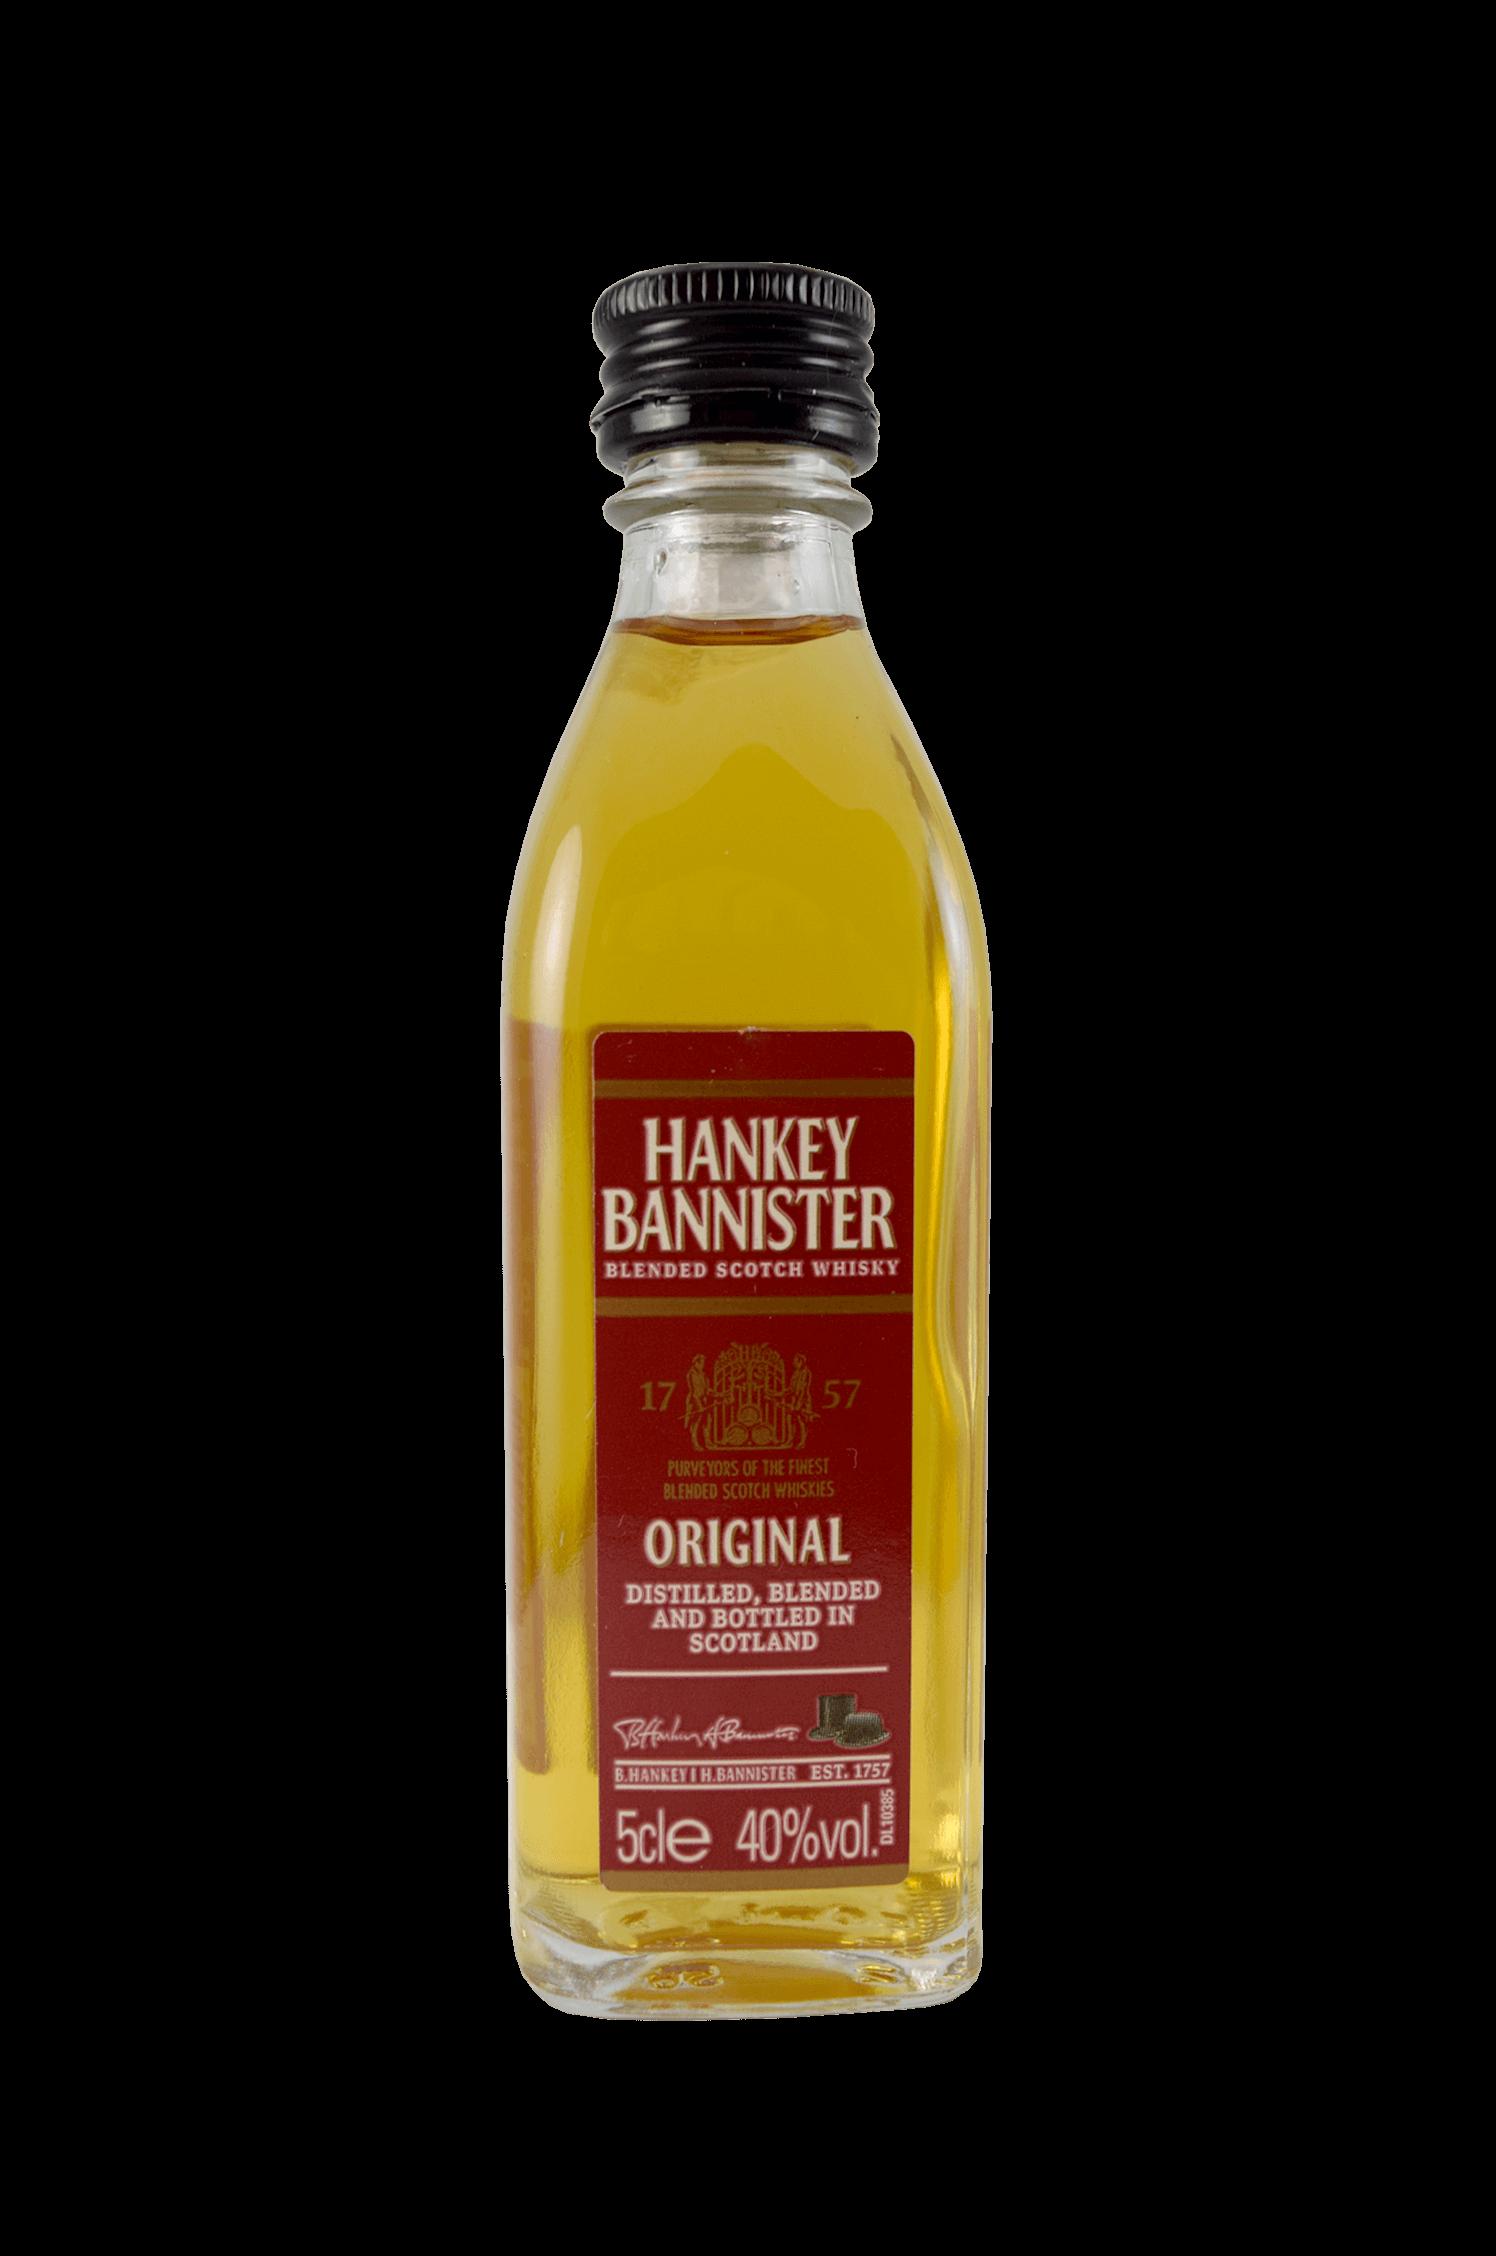 Hankey Bannister Whisky